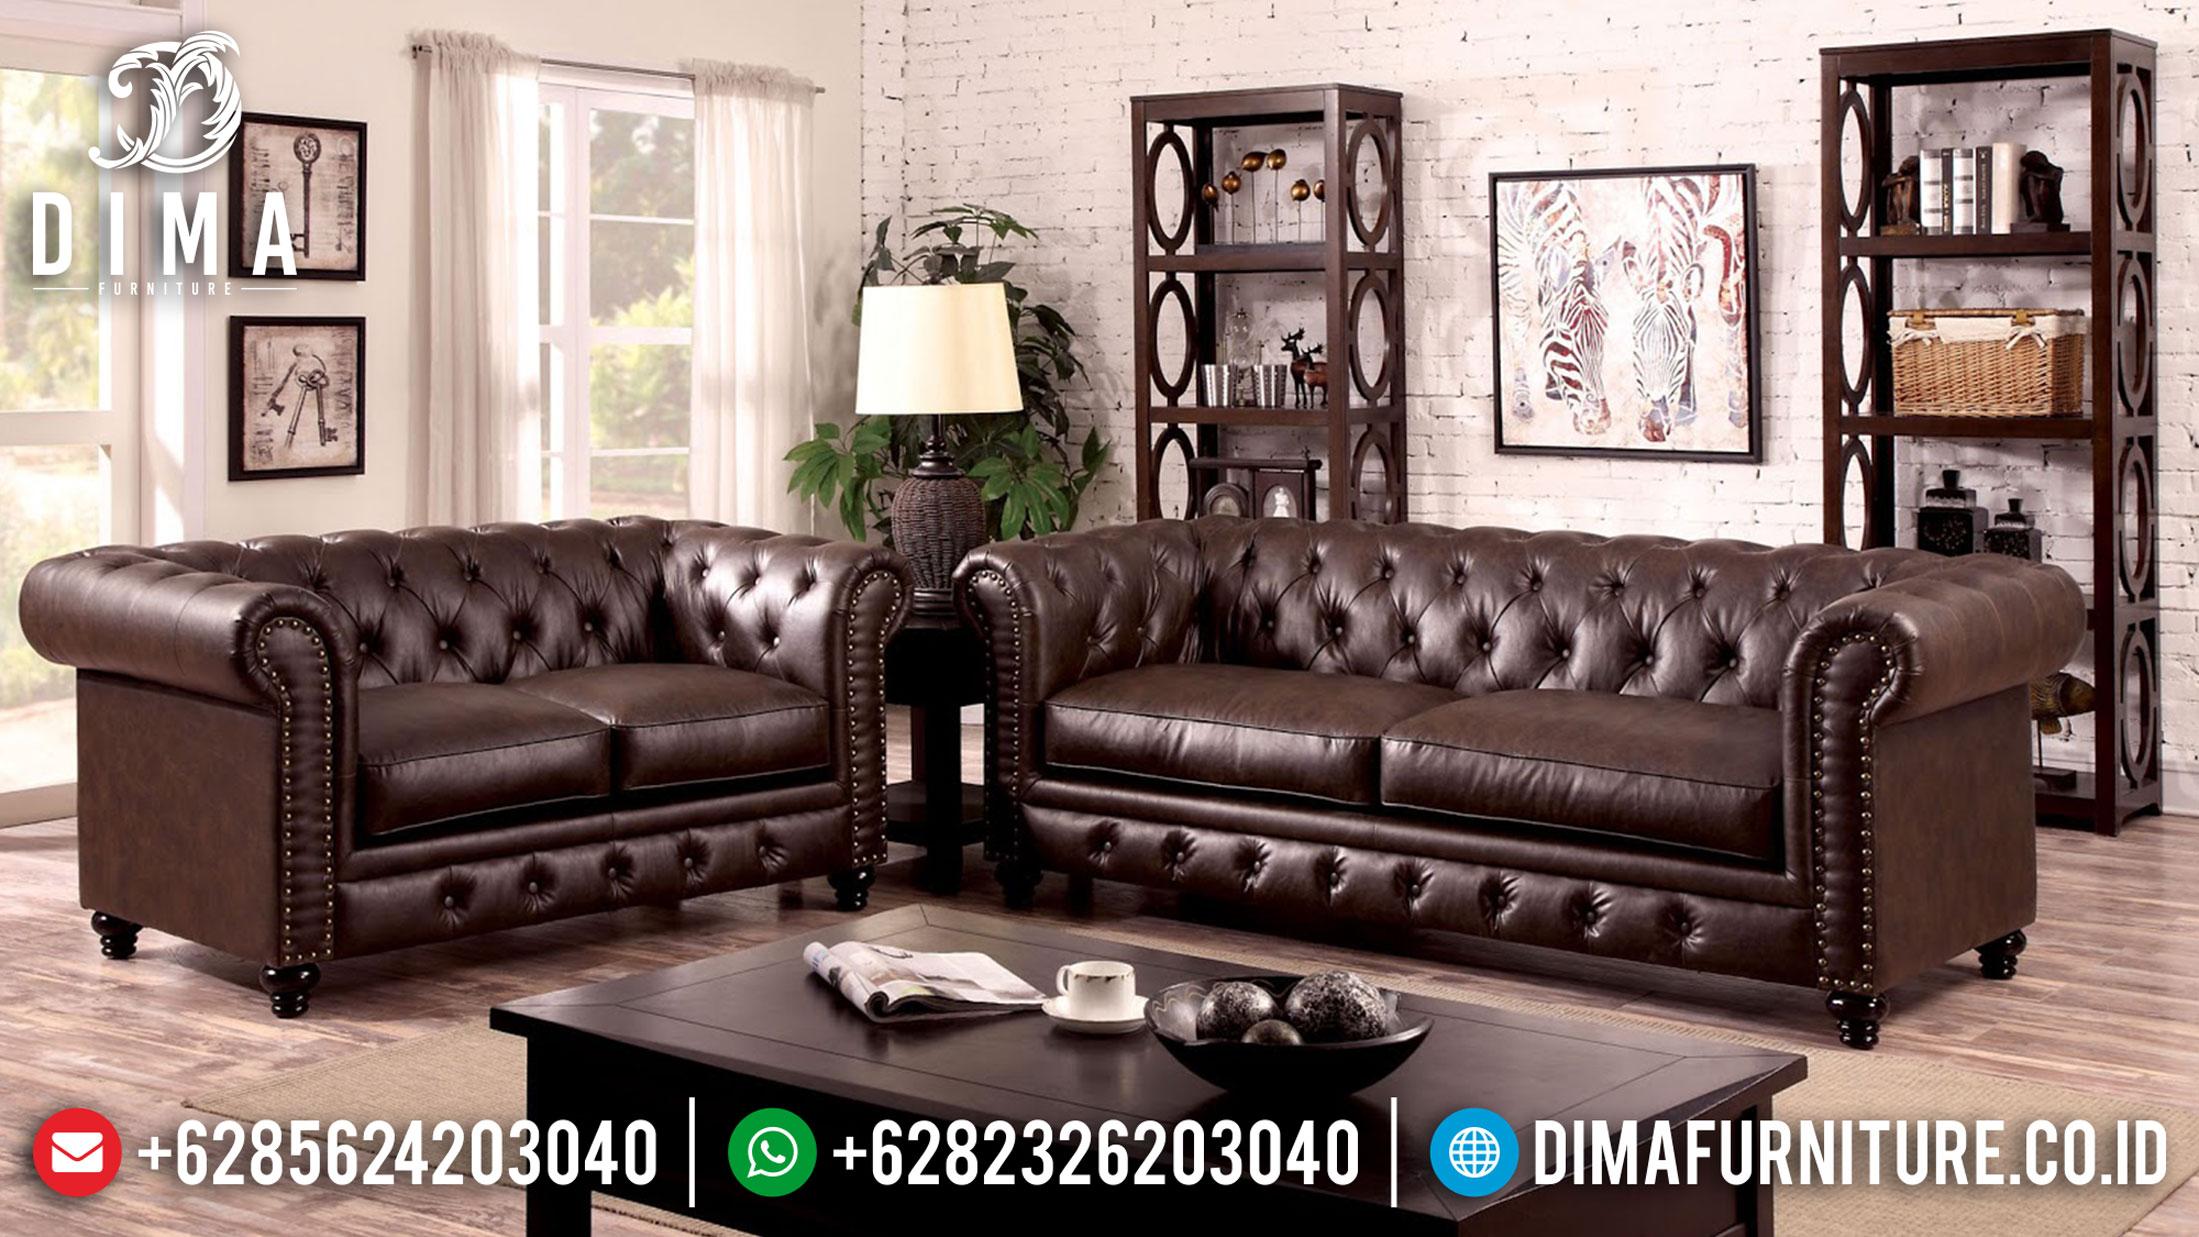 Model Sofa Tamu Minimalis Chesterfield New Oscar Leather Natural Jati TTJ-1202